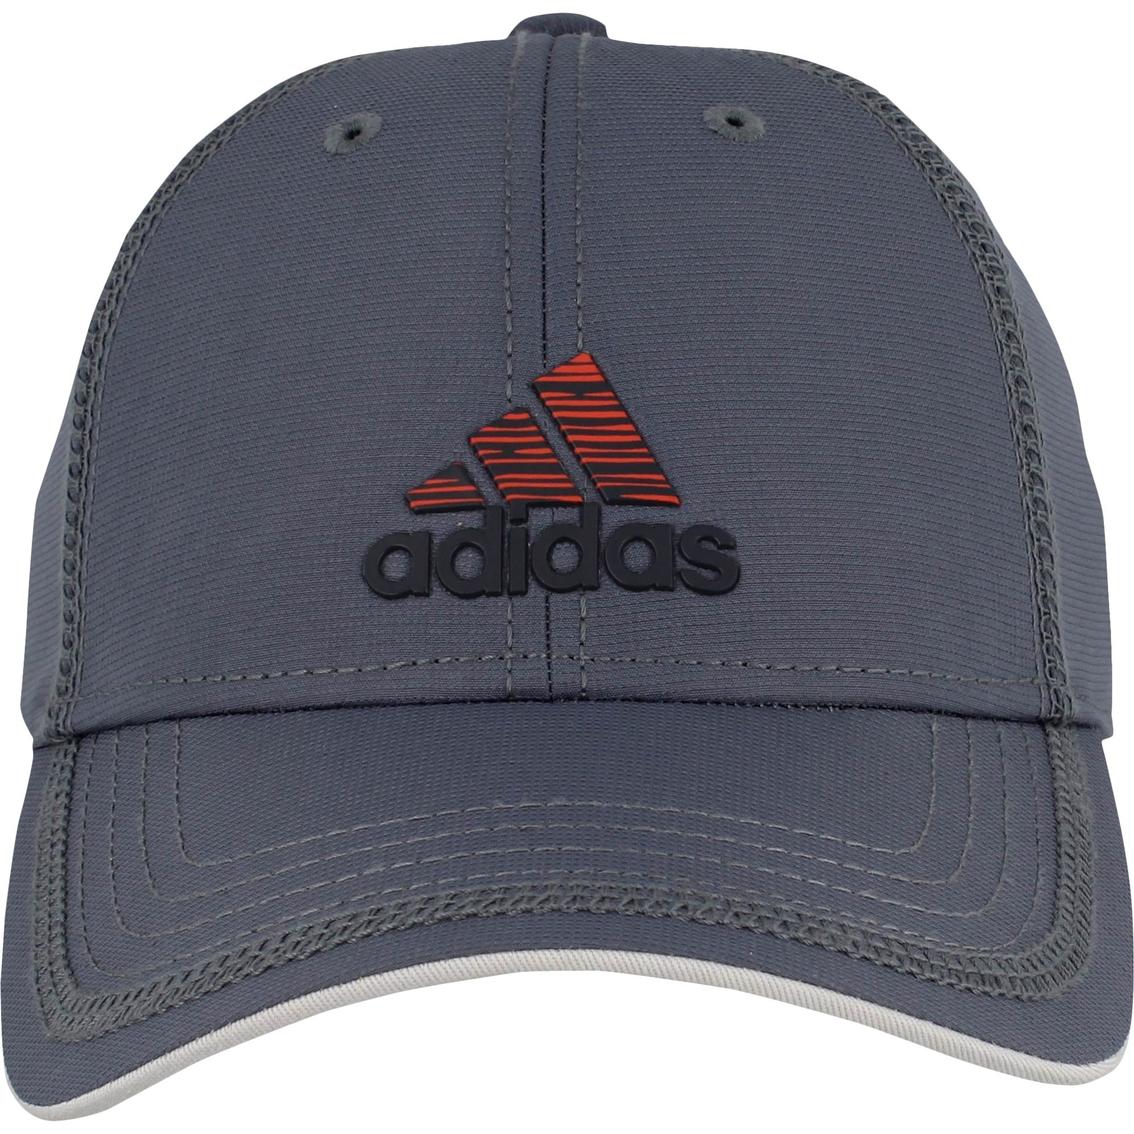 055a322dad6 Adidas Men s Contract Ii Cap